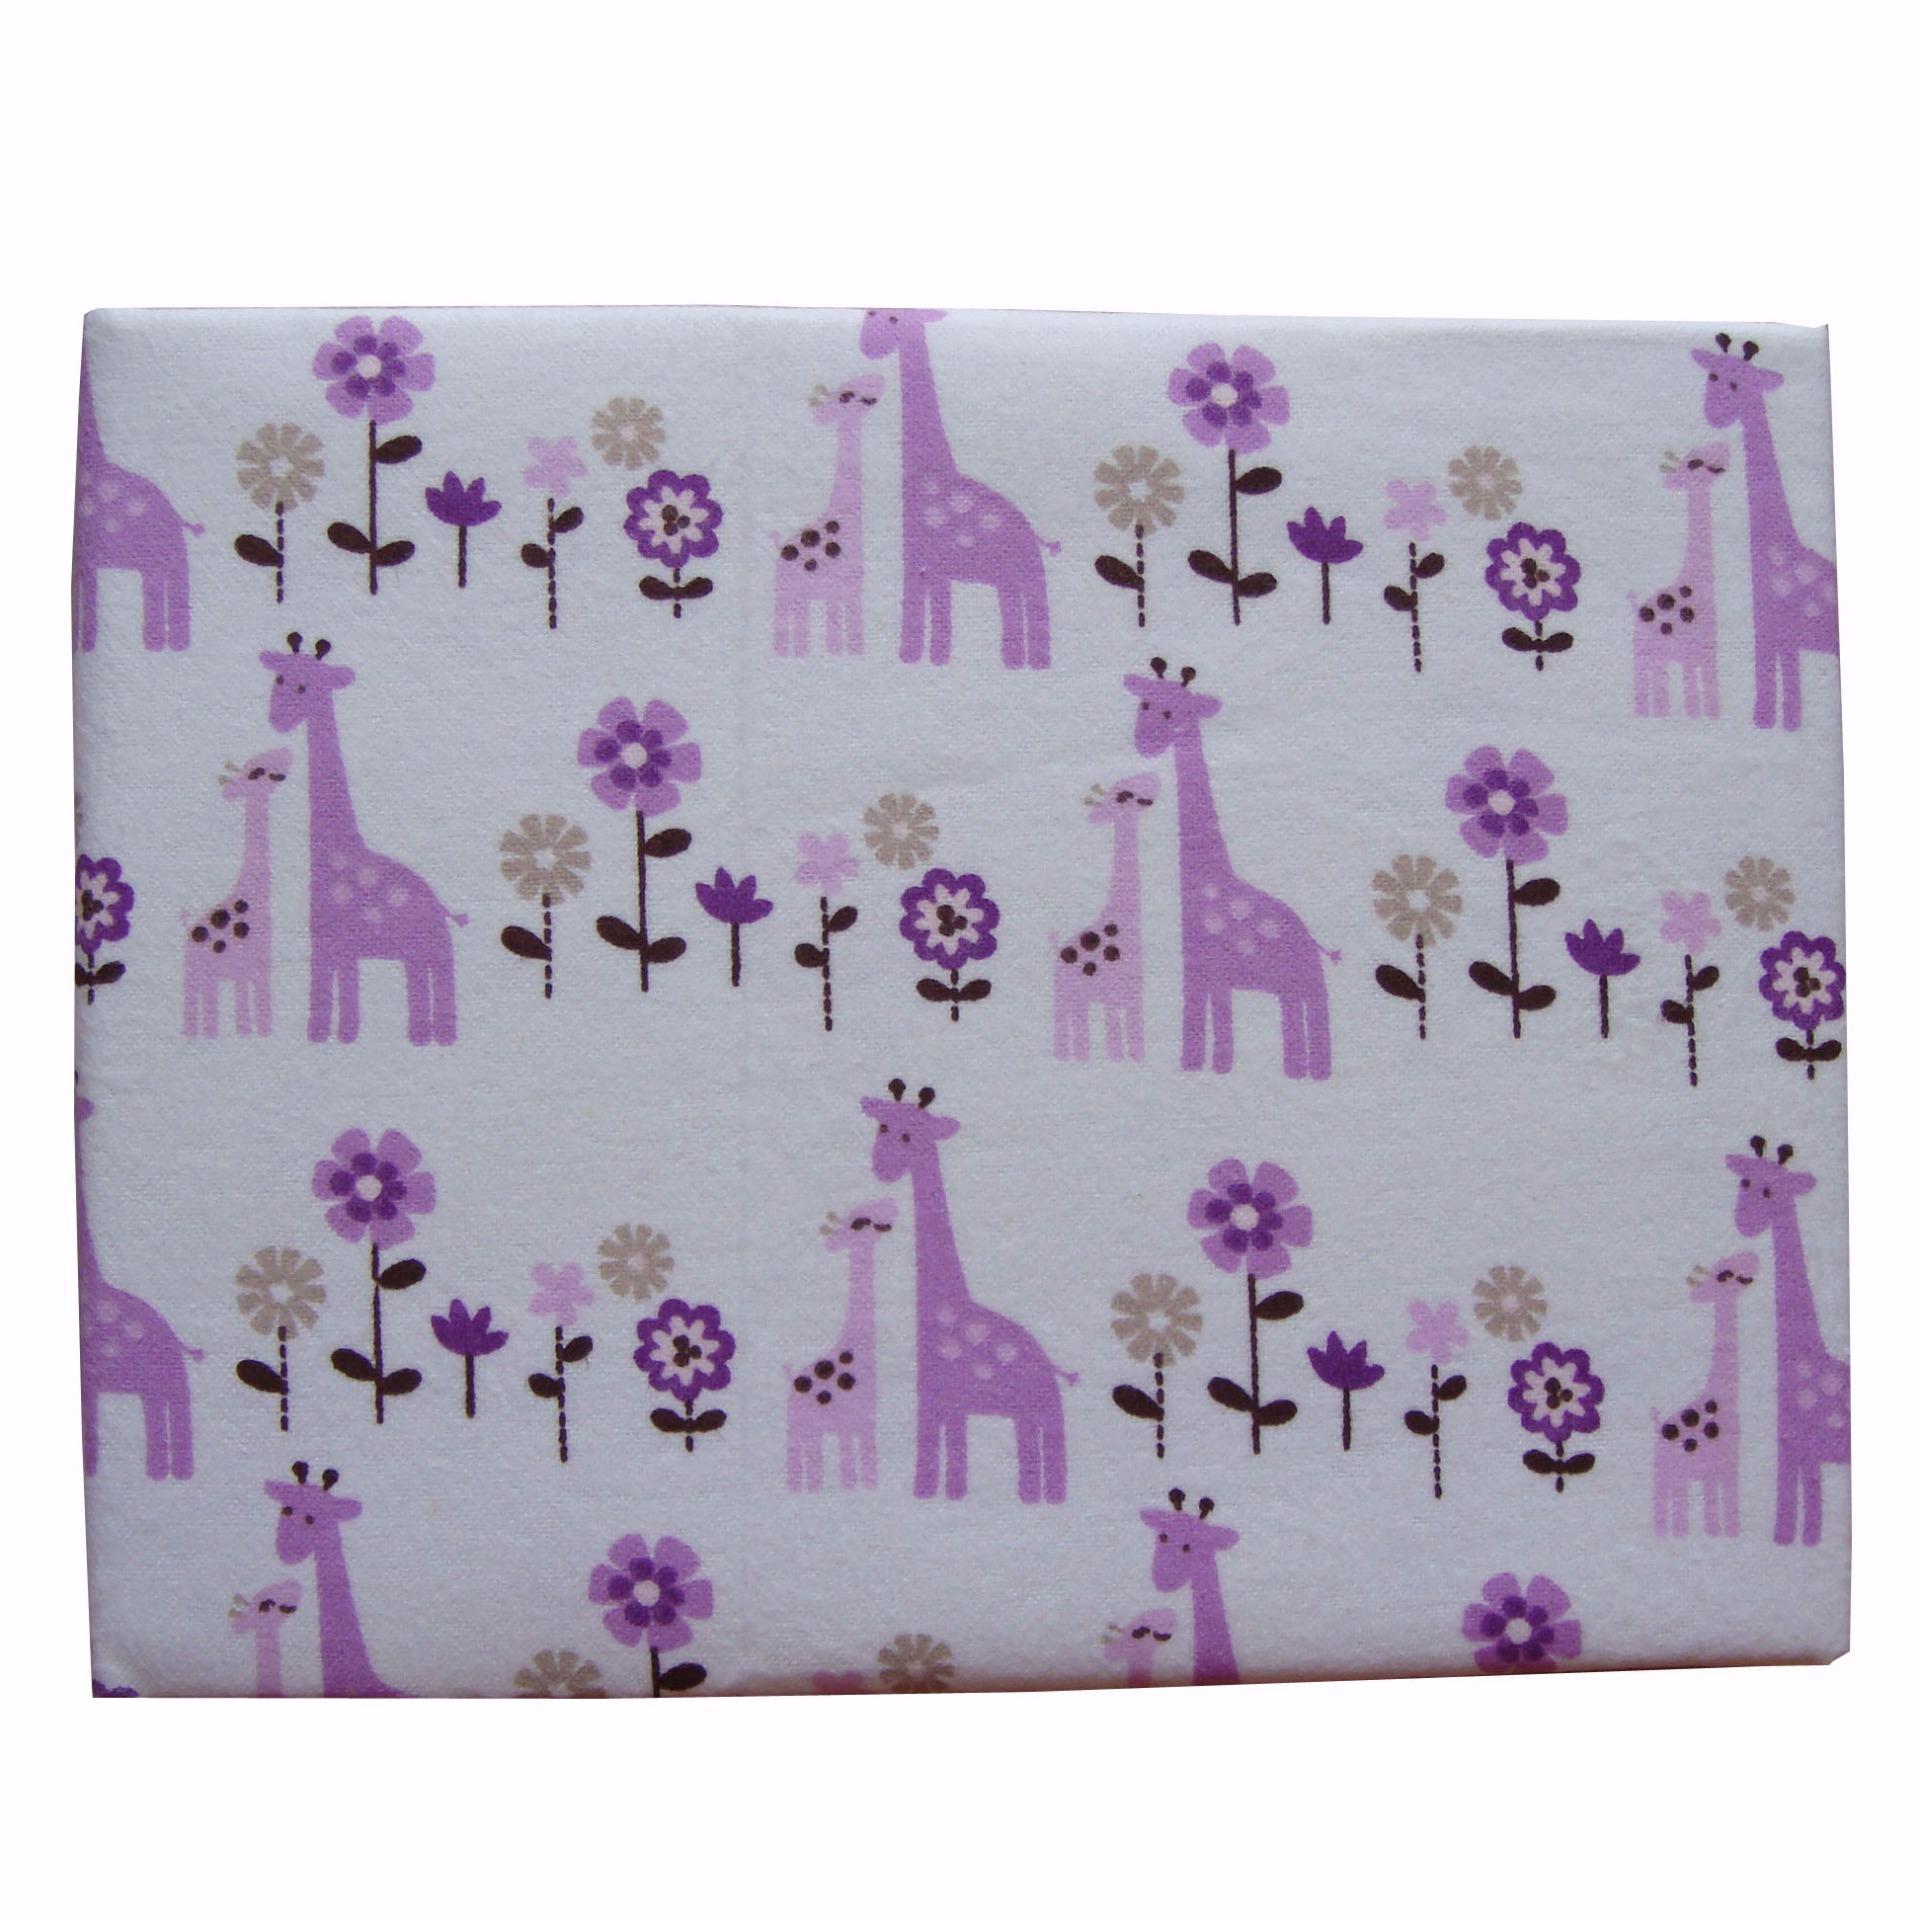 Perbandingan Harga Mykenzie Baby Keep Me Dry Quilt Pad Perlak Alas Ompol Flanel Waterproof 70X120Cm Giraffe Mykenzie Di Banten